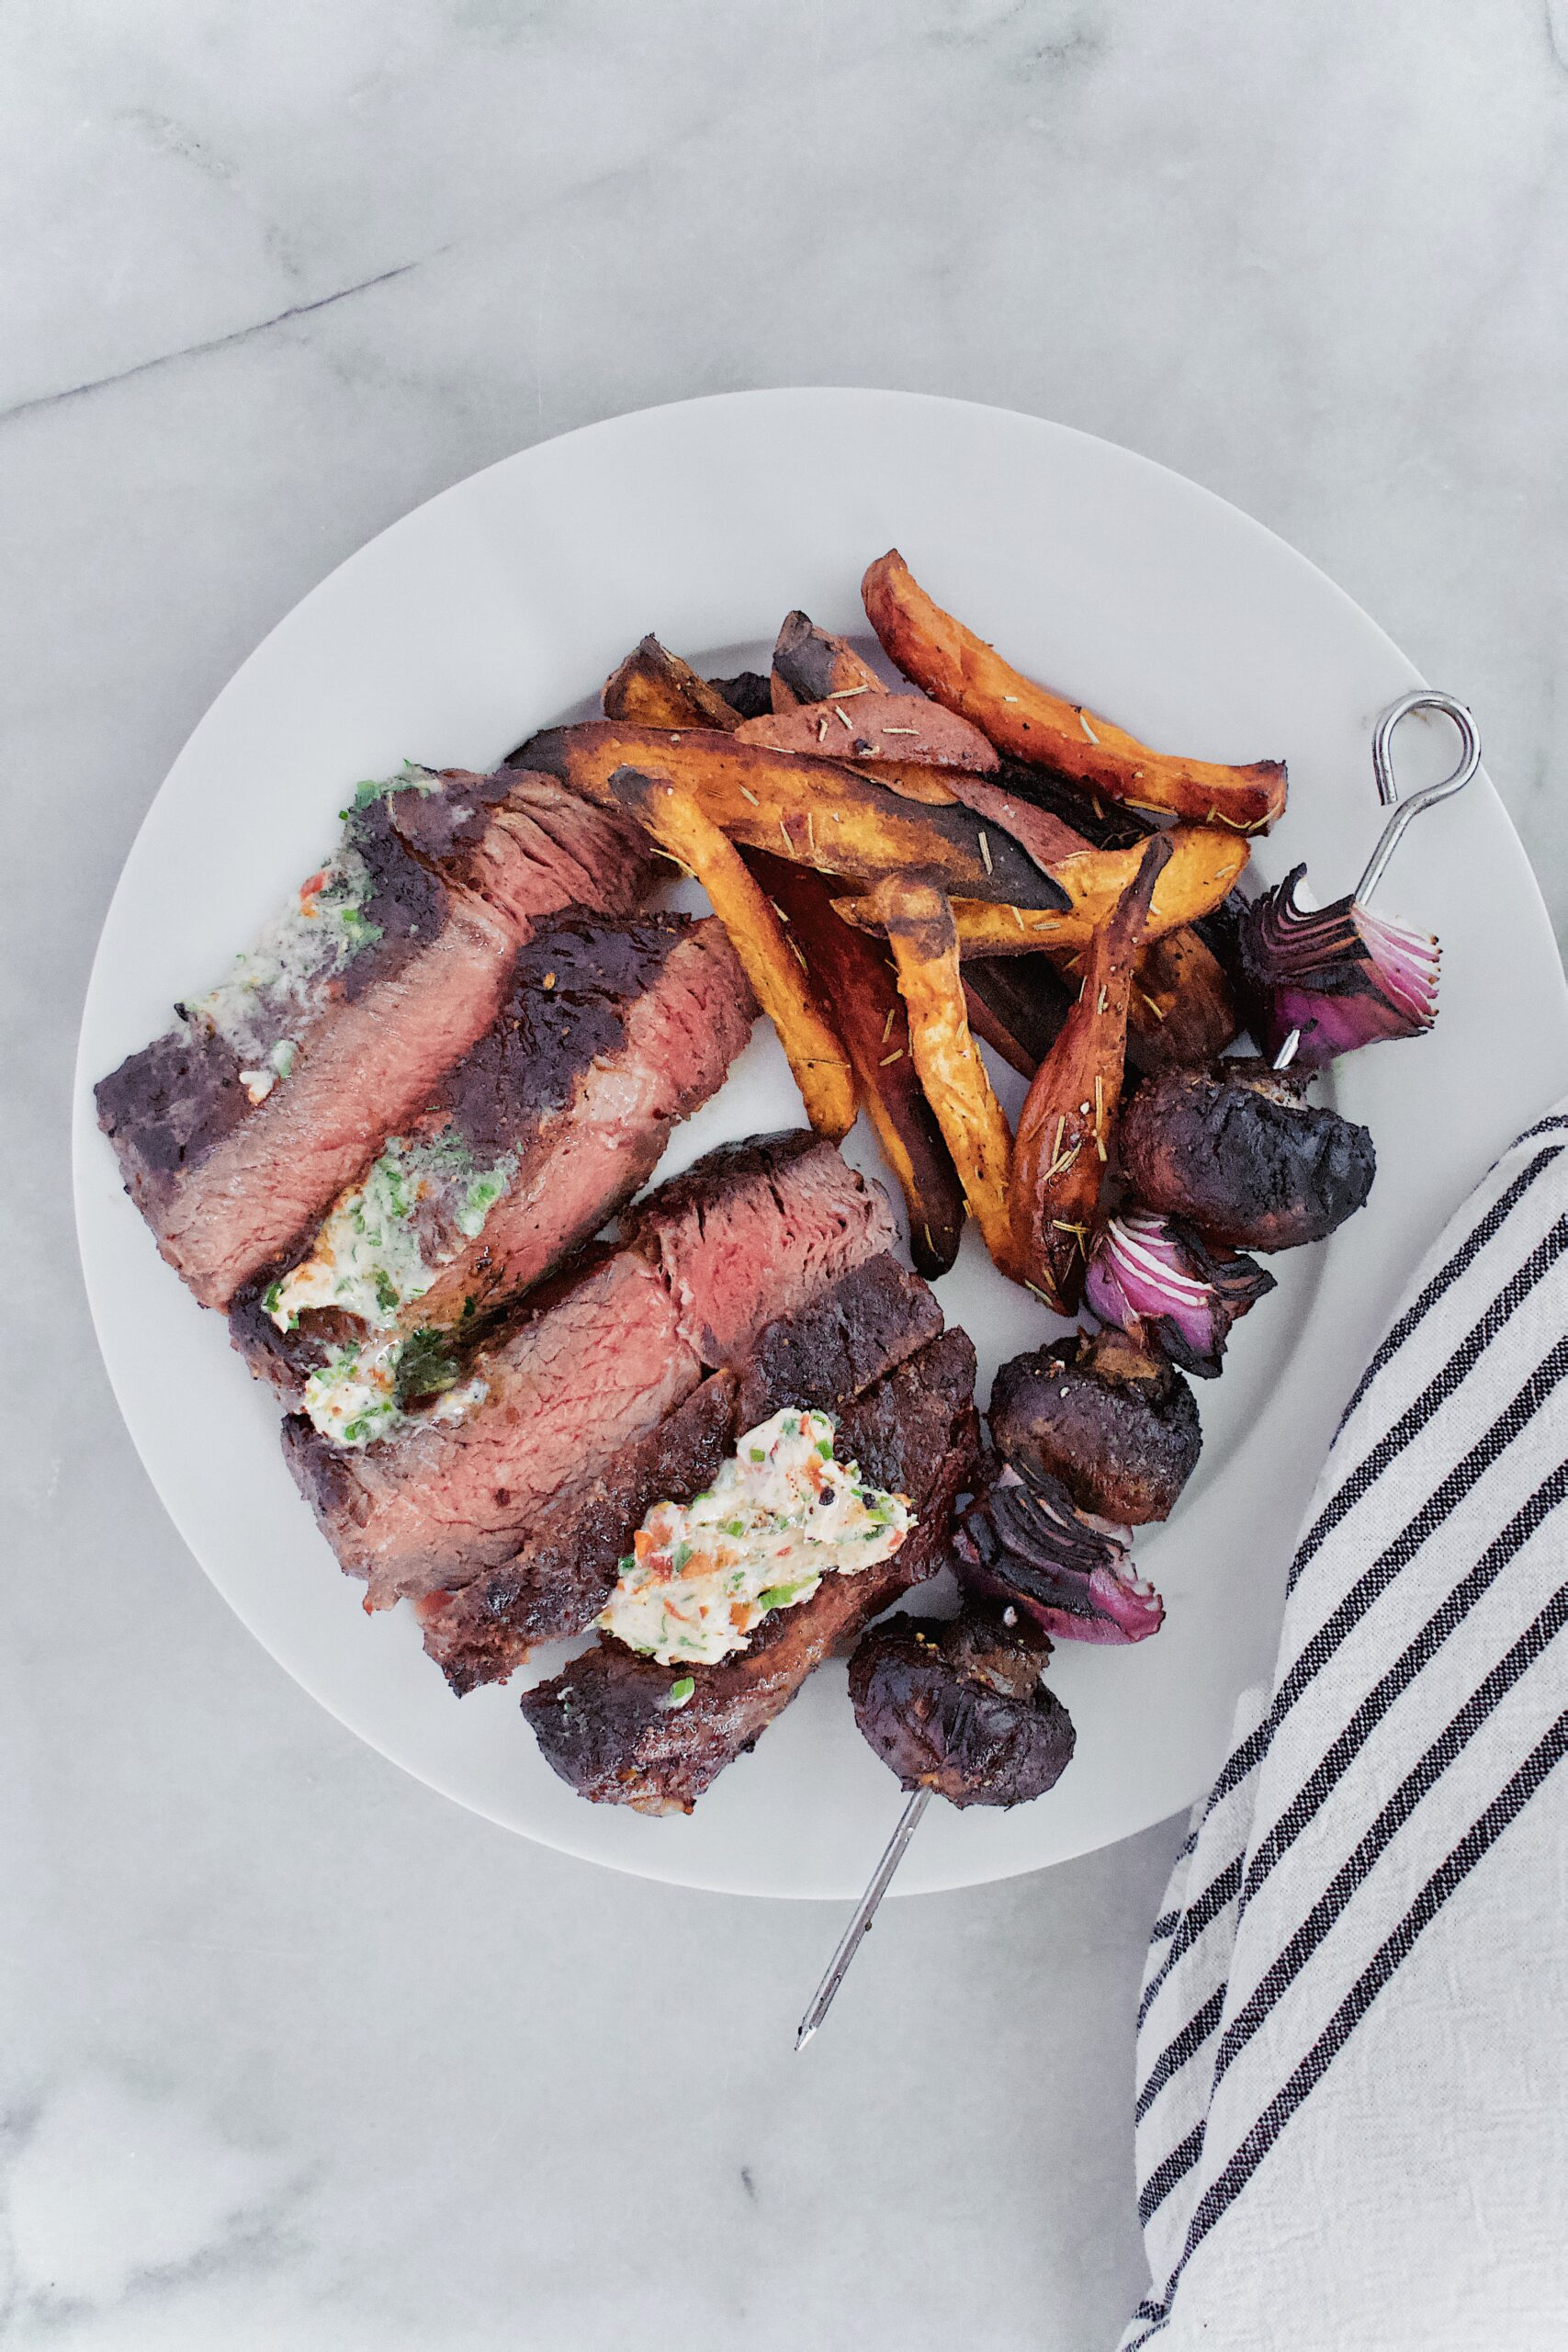 Joanna Gaines recipe for Becki's Herb Butter served on Rib Eye Steak